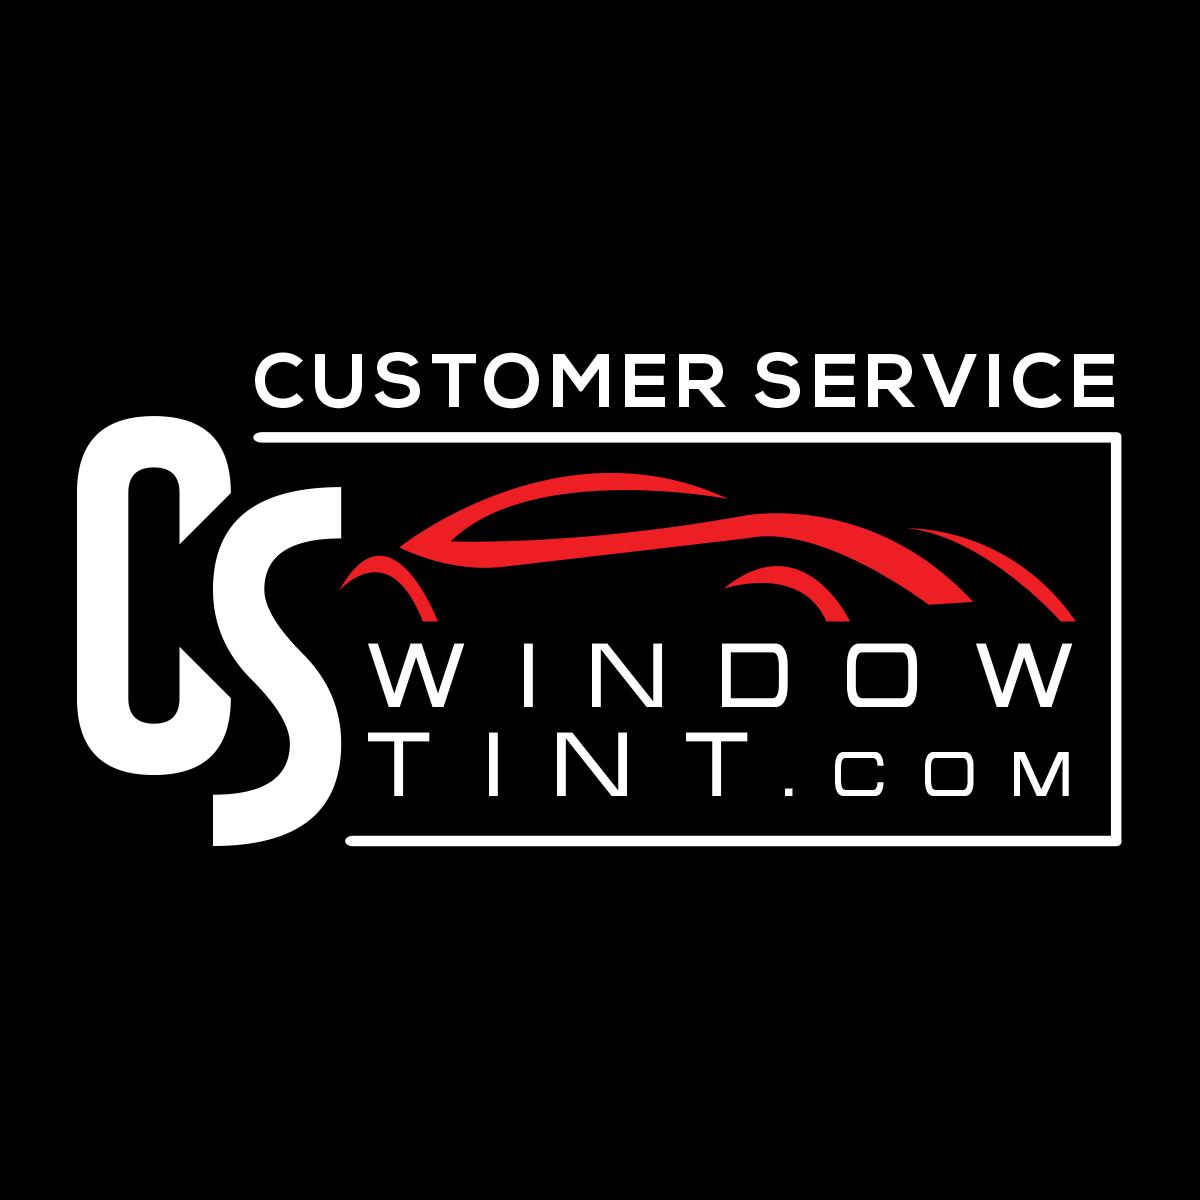 CS WINDOW TINT